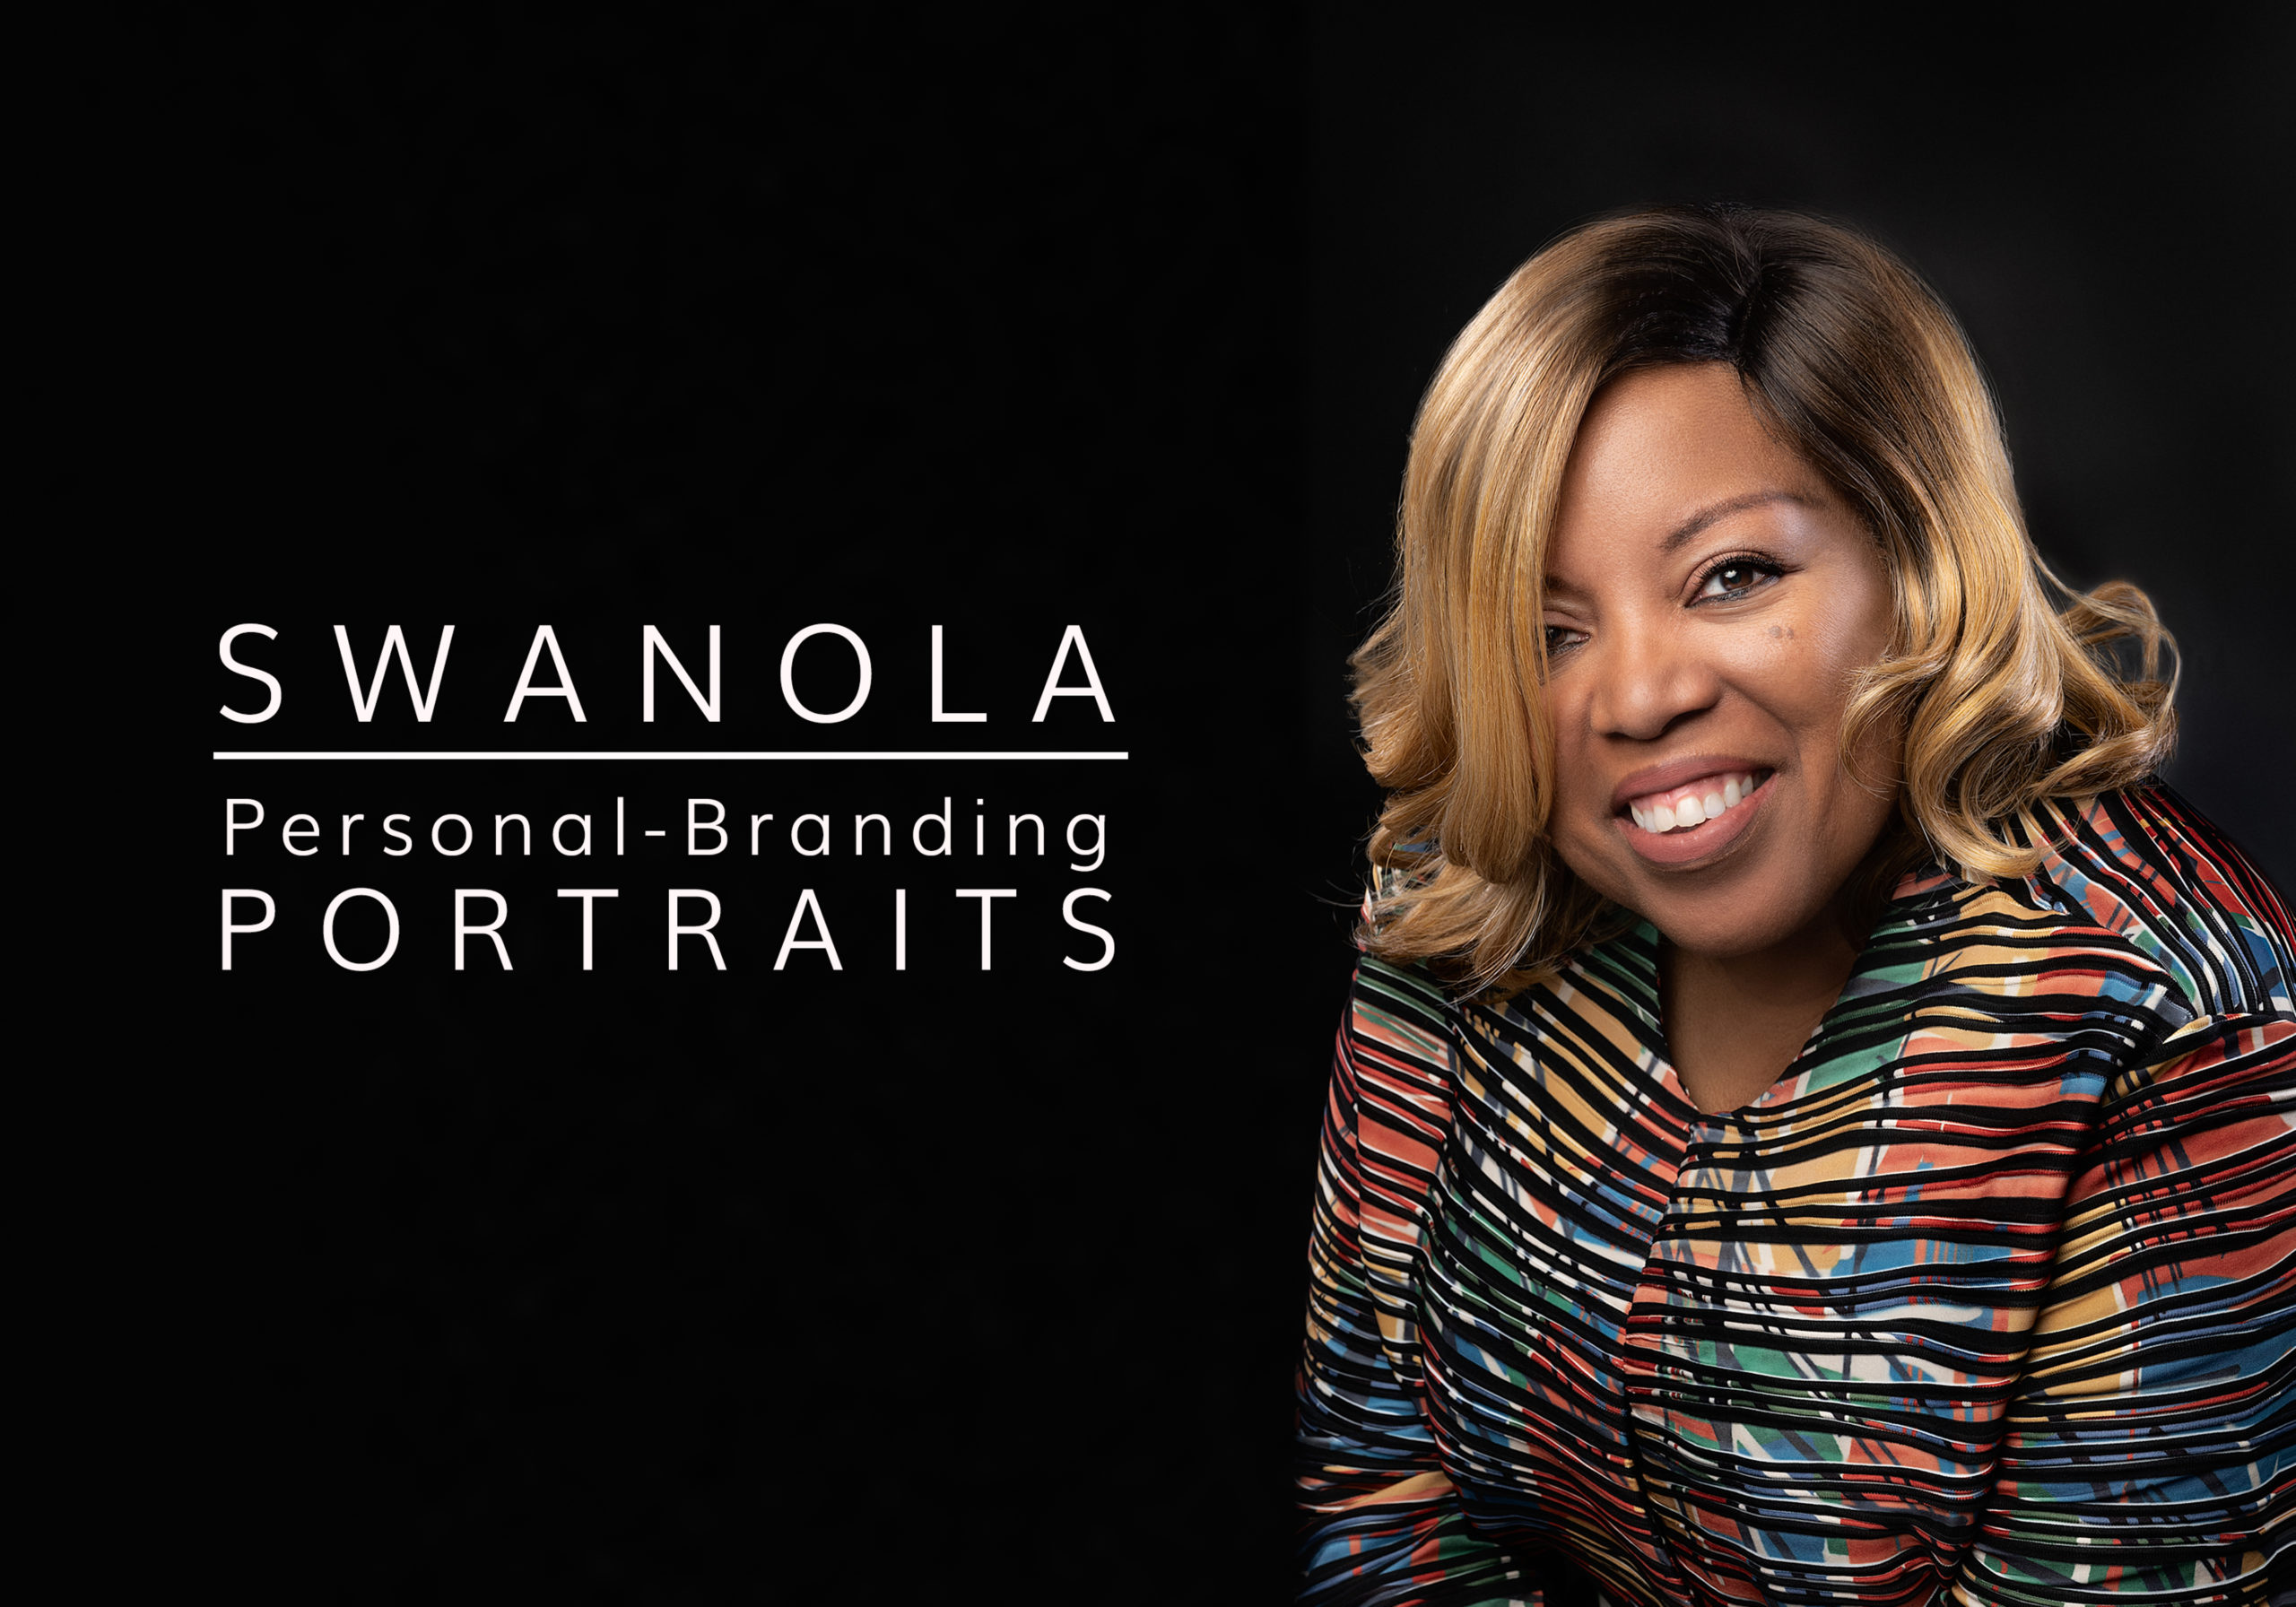 Personal branding portraits